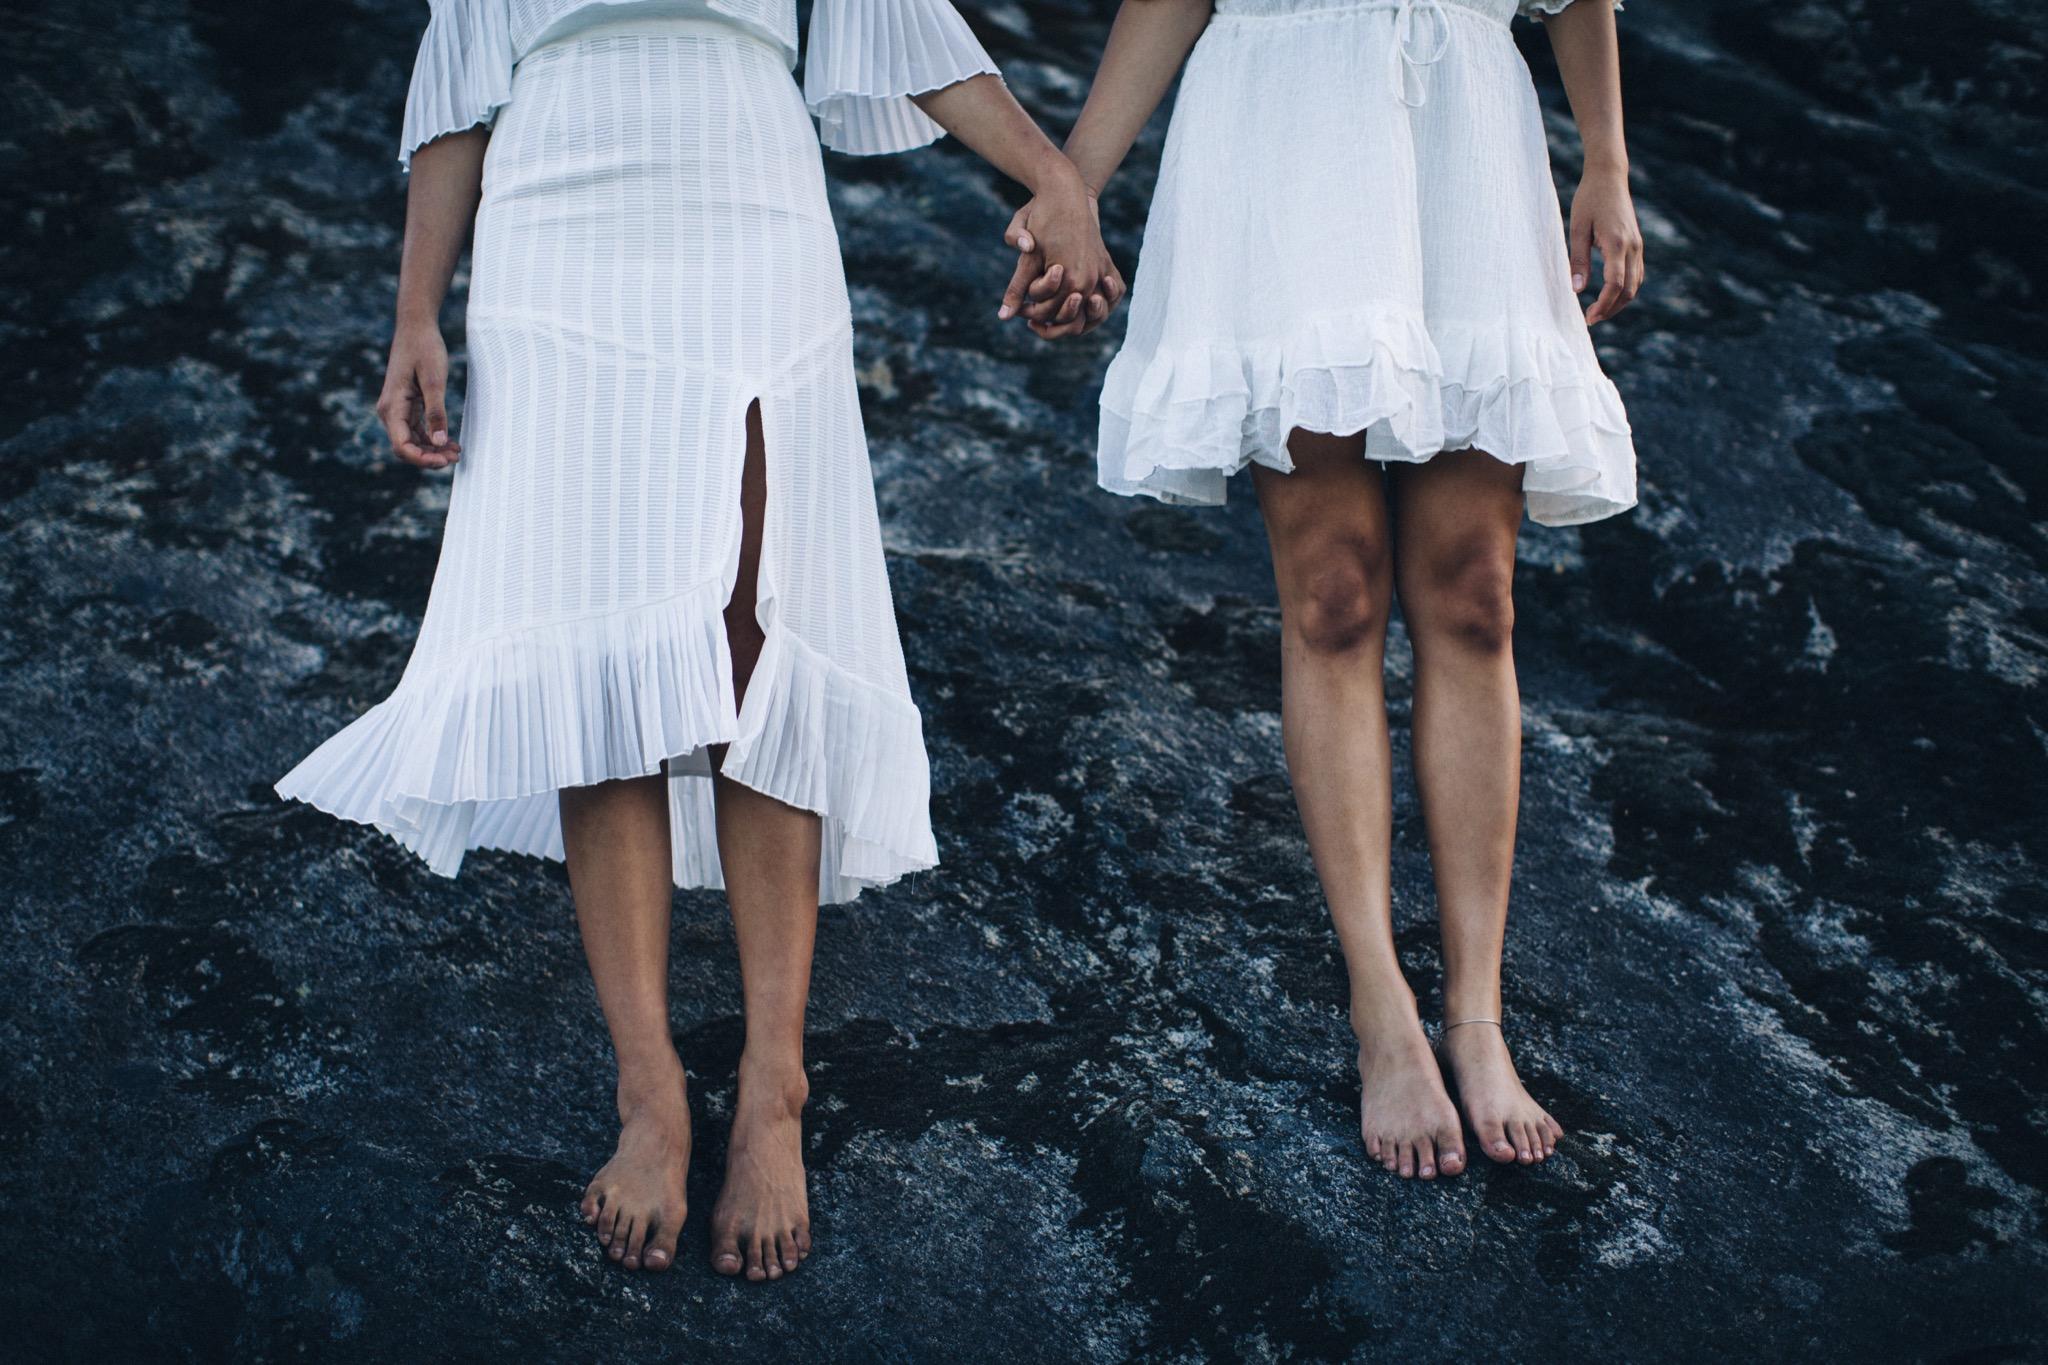 Anissa Wears   Stevie May Georgie Girl Midi Dress + 66 The Label Kingston Silk  Mary Wears   Stevie May Fantasy Mini Dress